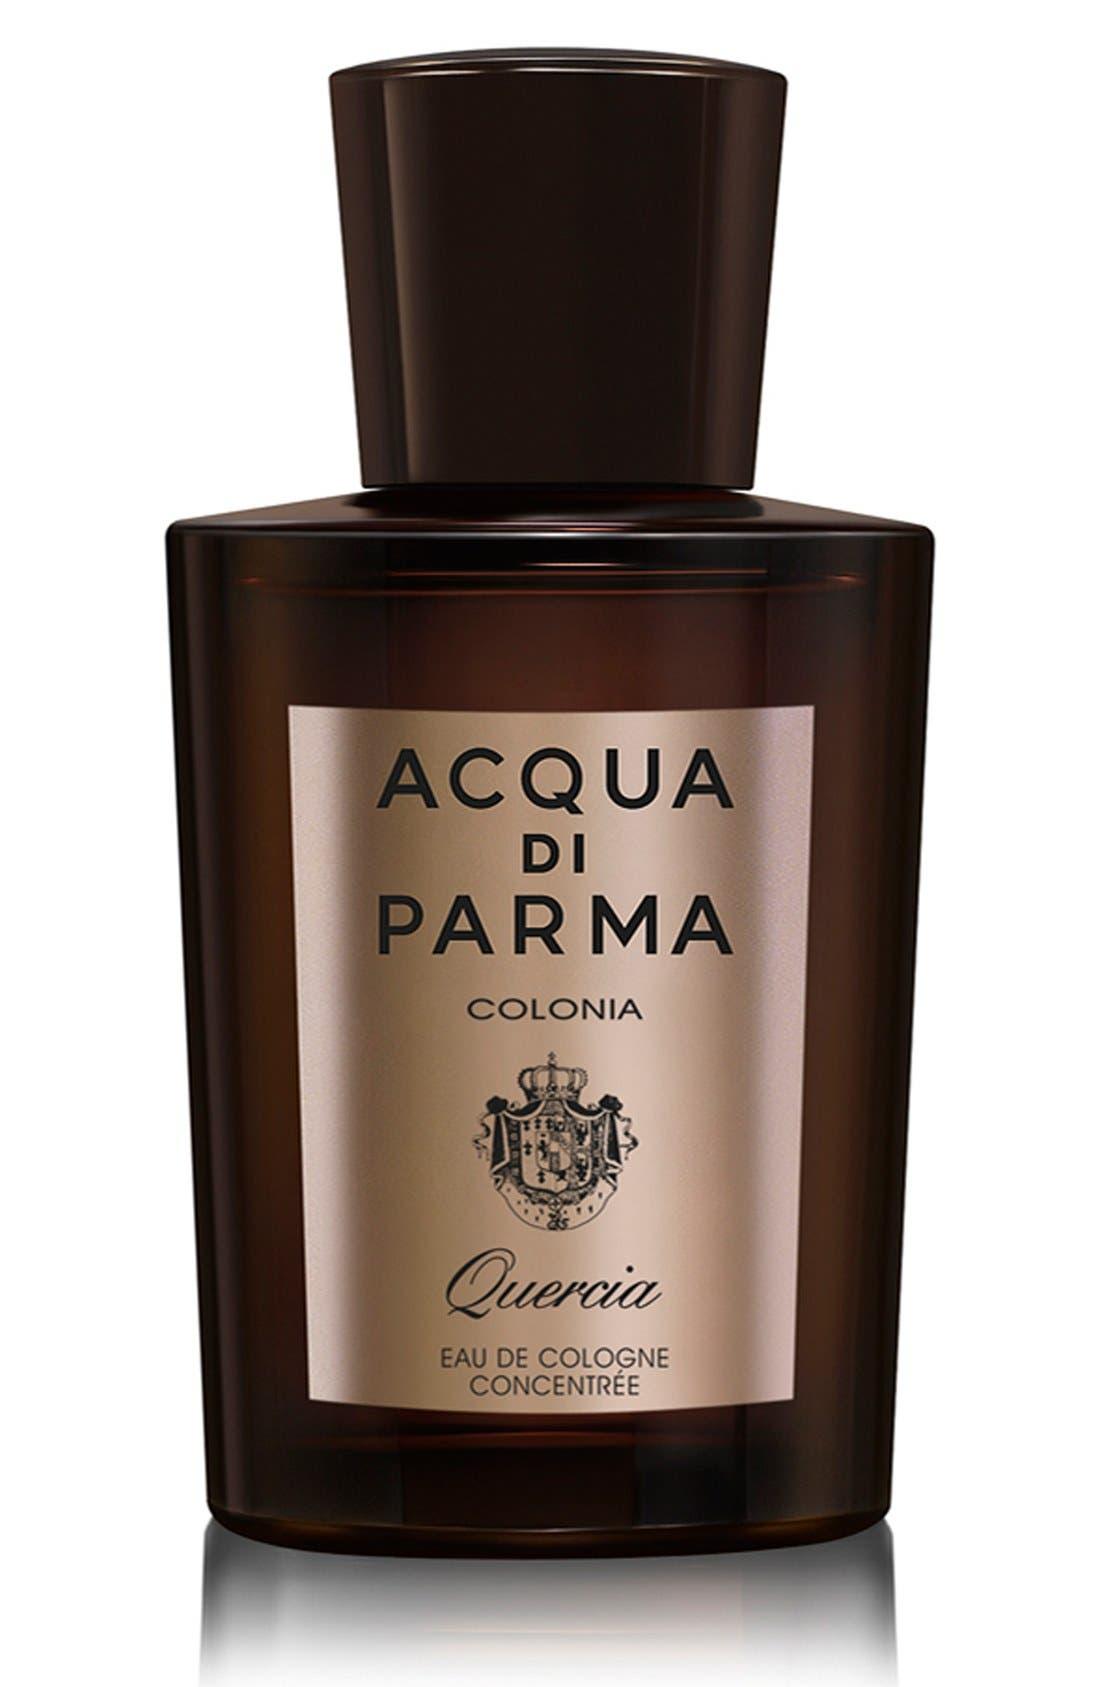 Acqua di Parma 'Colonia Quercia' Eau de Cologne Concentrée